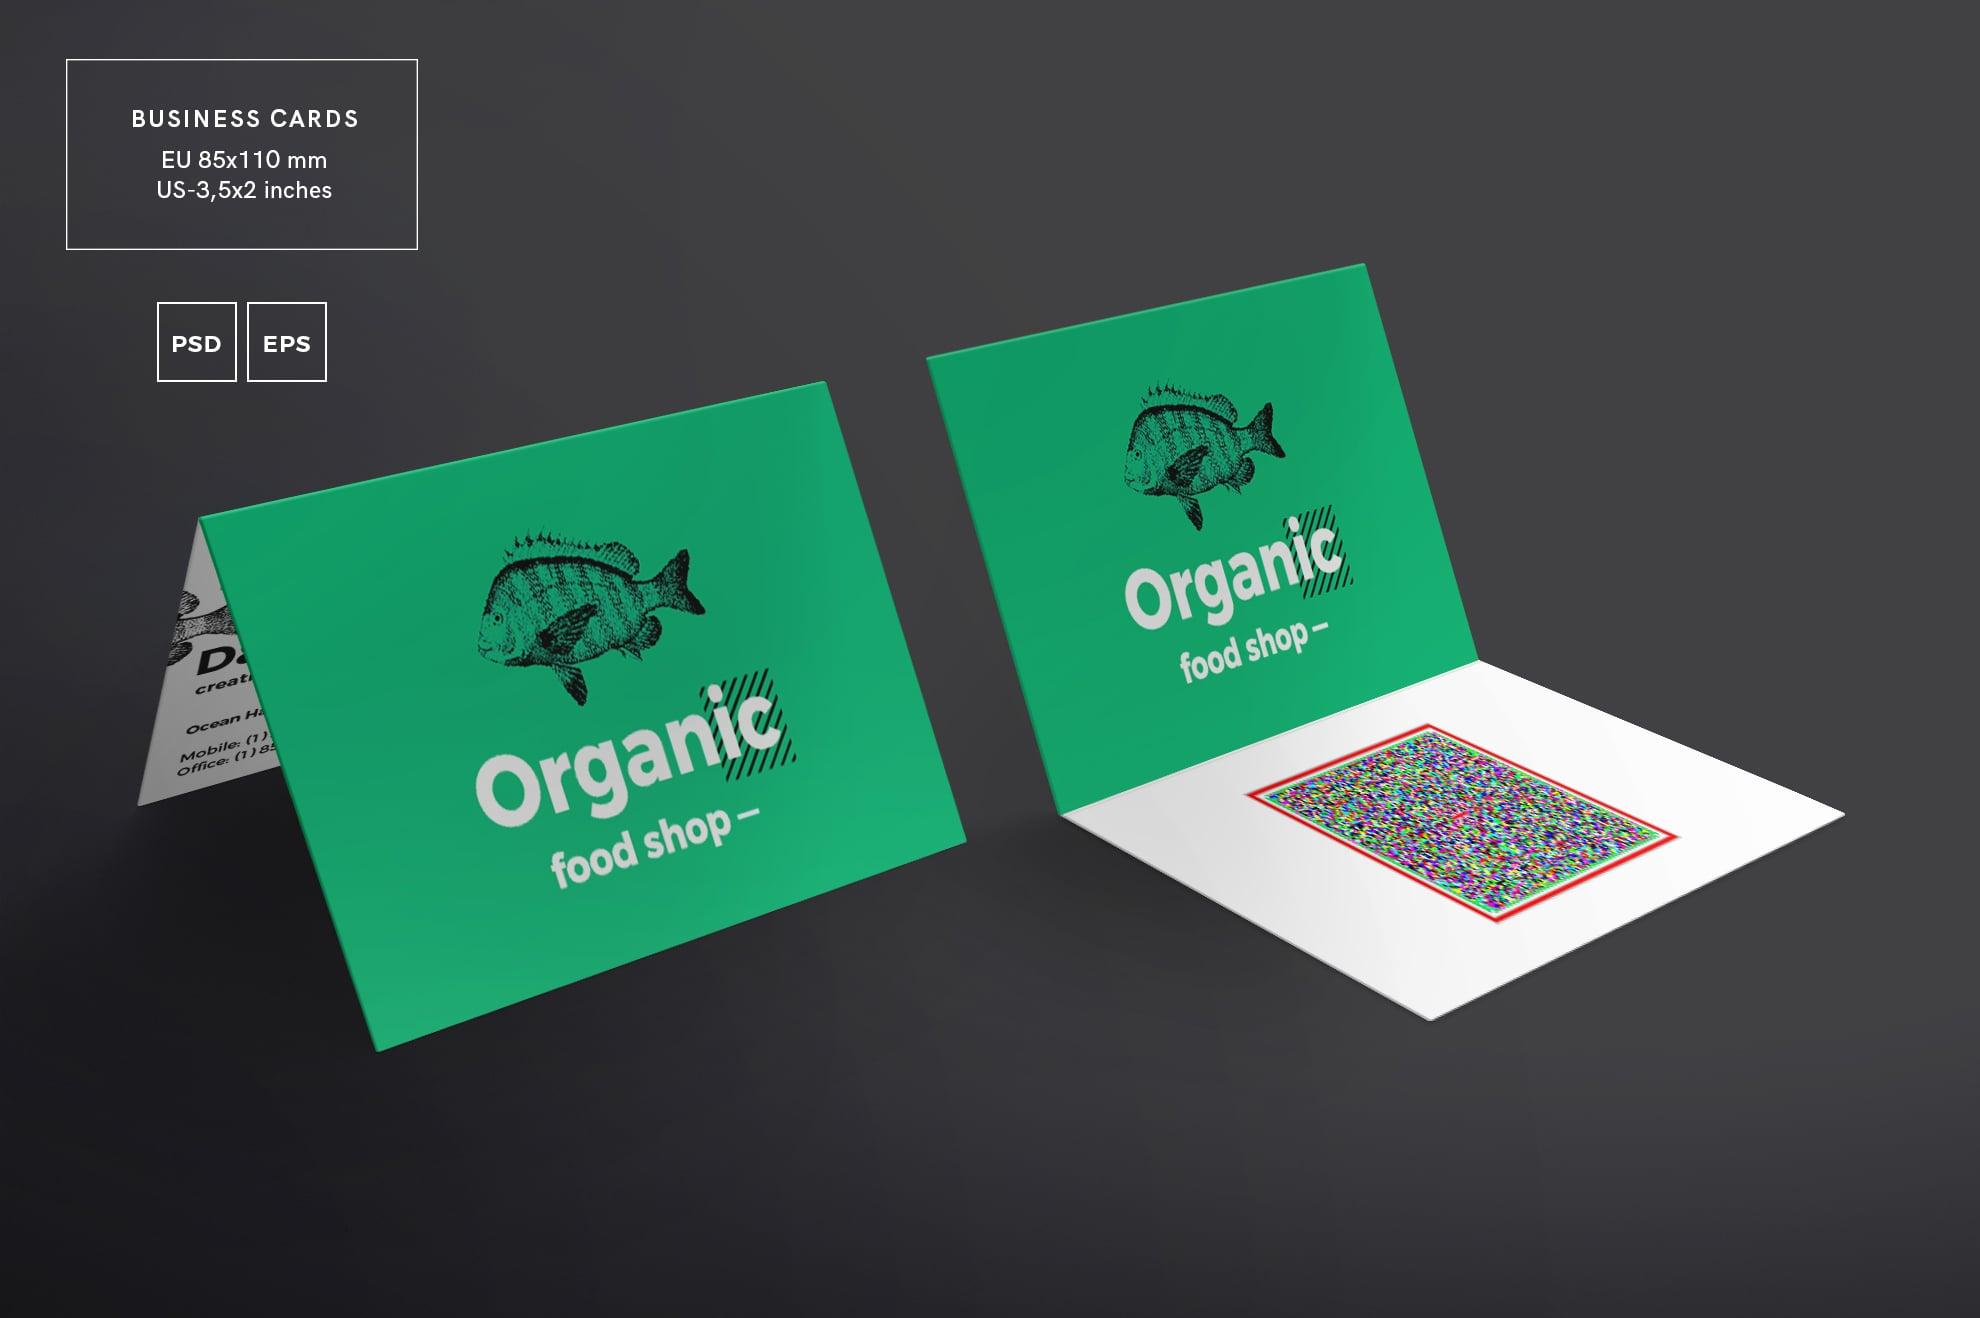 110 in 1 Business Card Bundle - 001 bc organic food shop 12 2